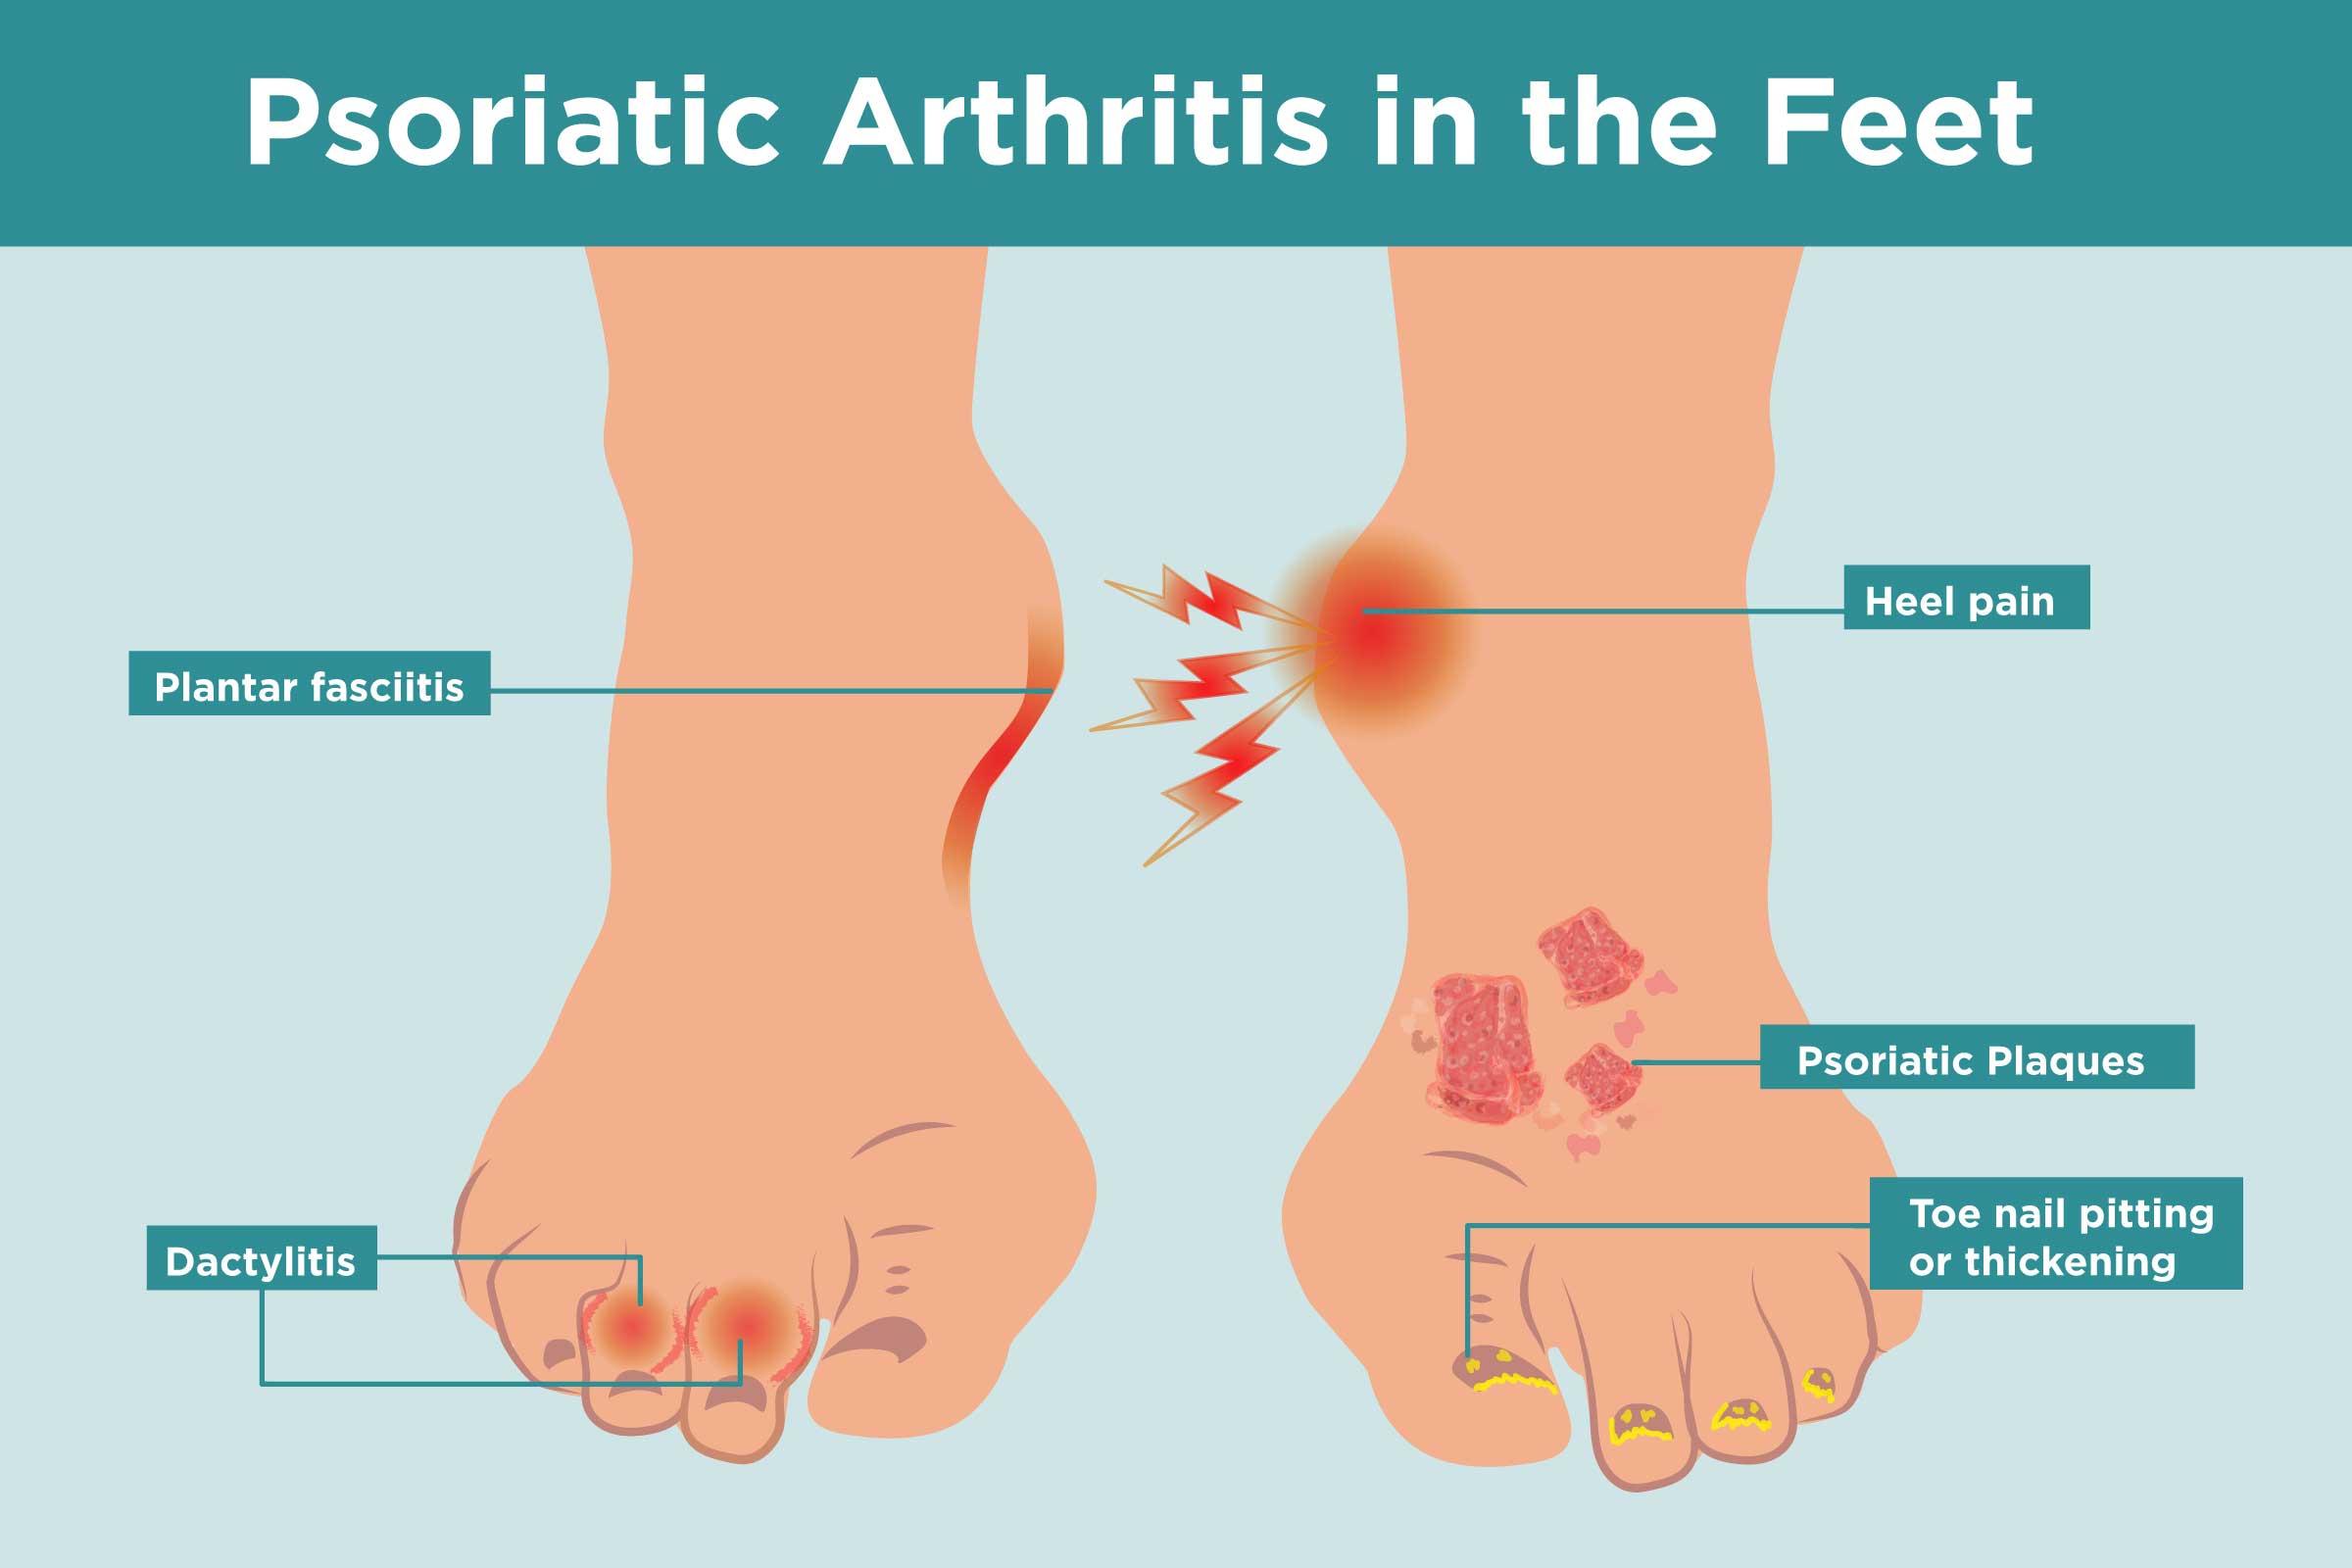 Foot Pain Diagram Psoriatic Arthritis In The Feet Symptoms Treatment Home Remedies